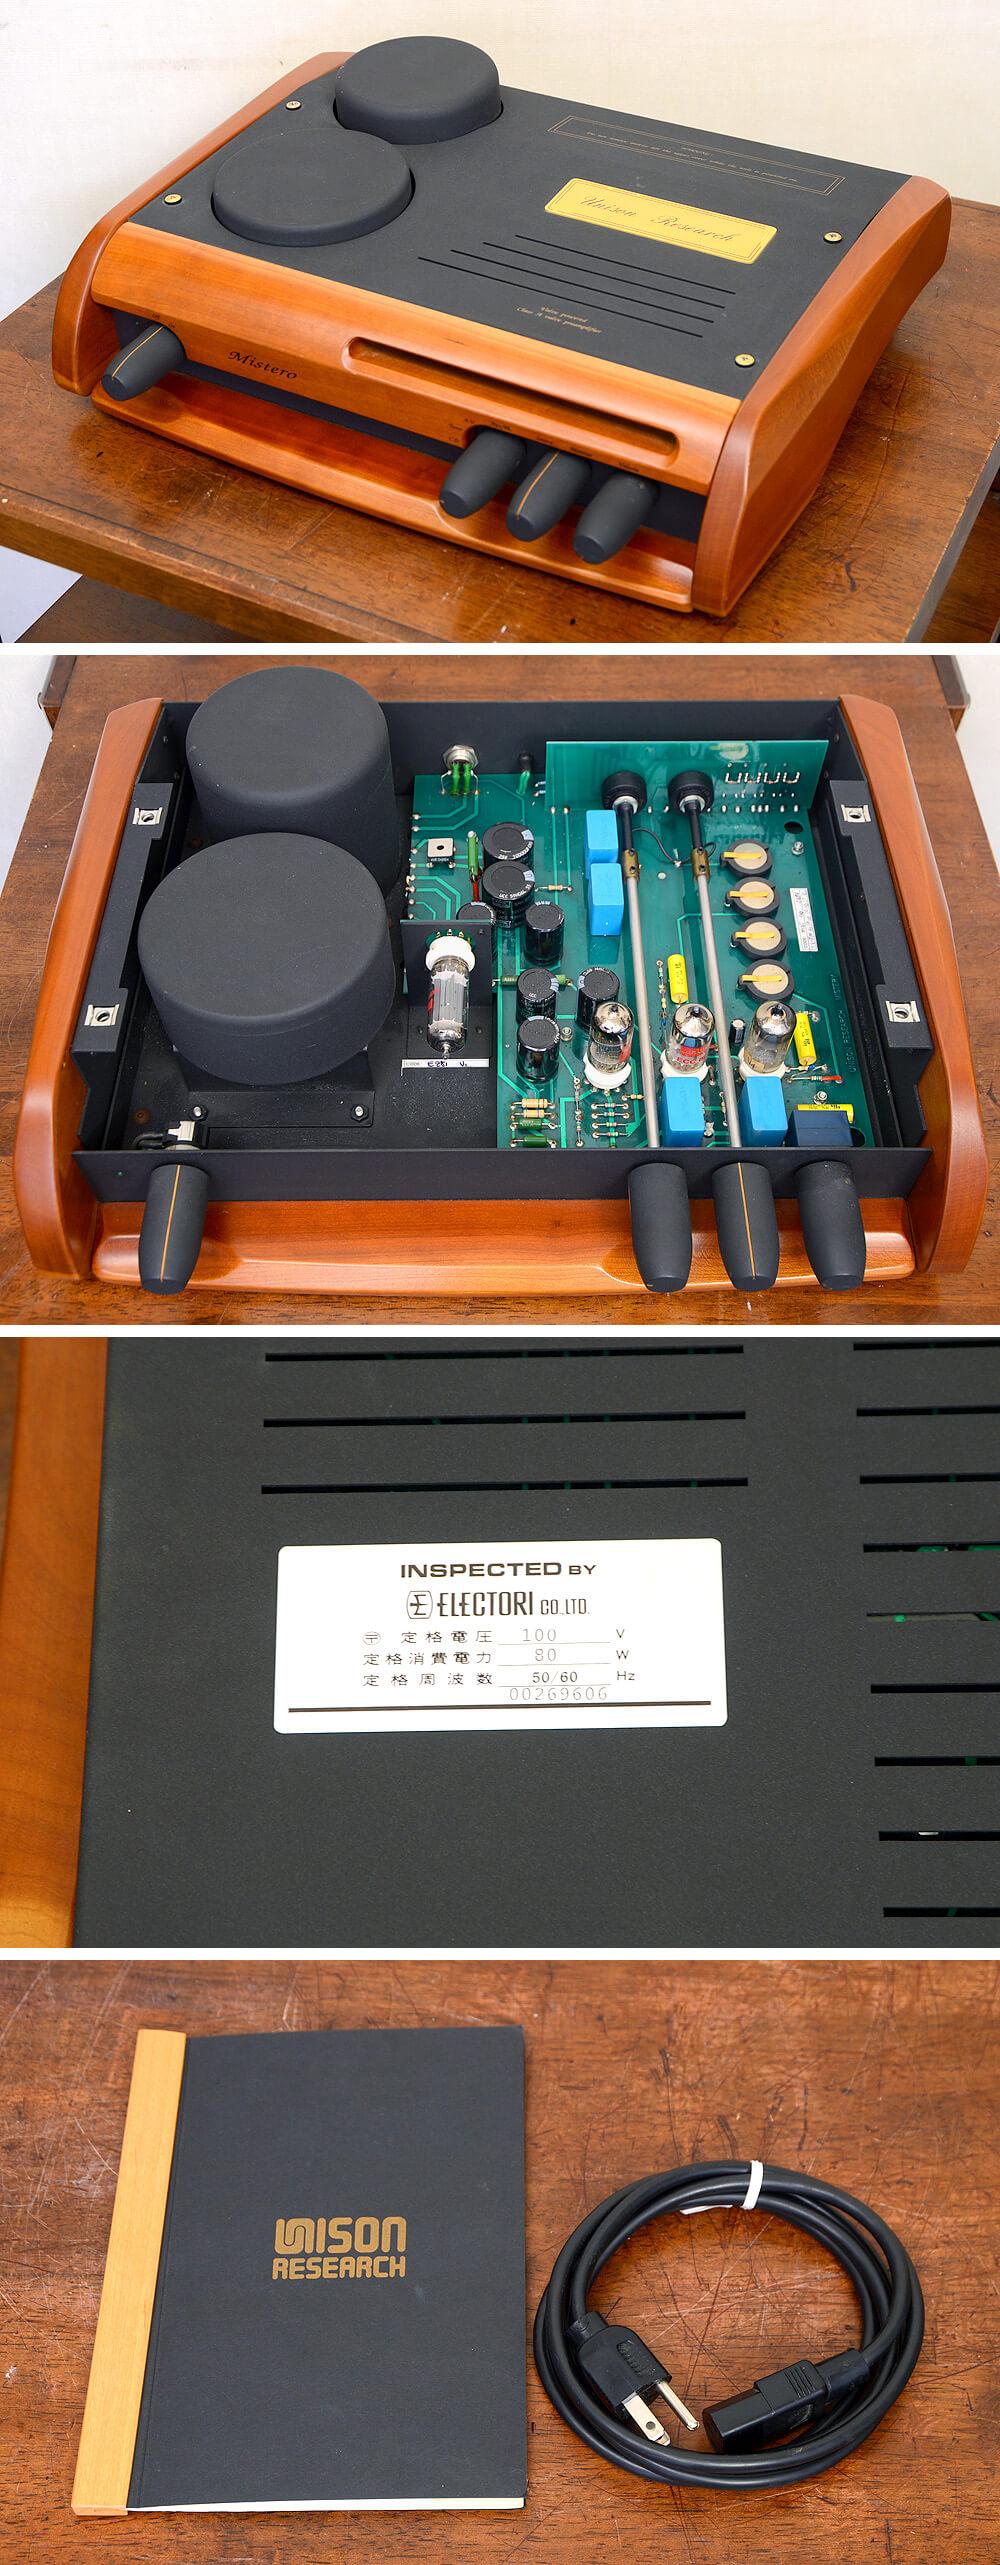 Unison Research ユニゾンリサーチ MISTERO5枚目